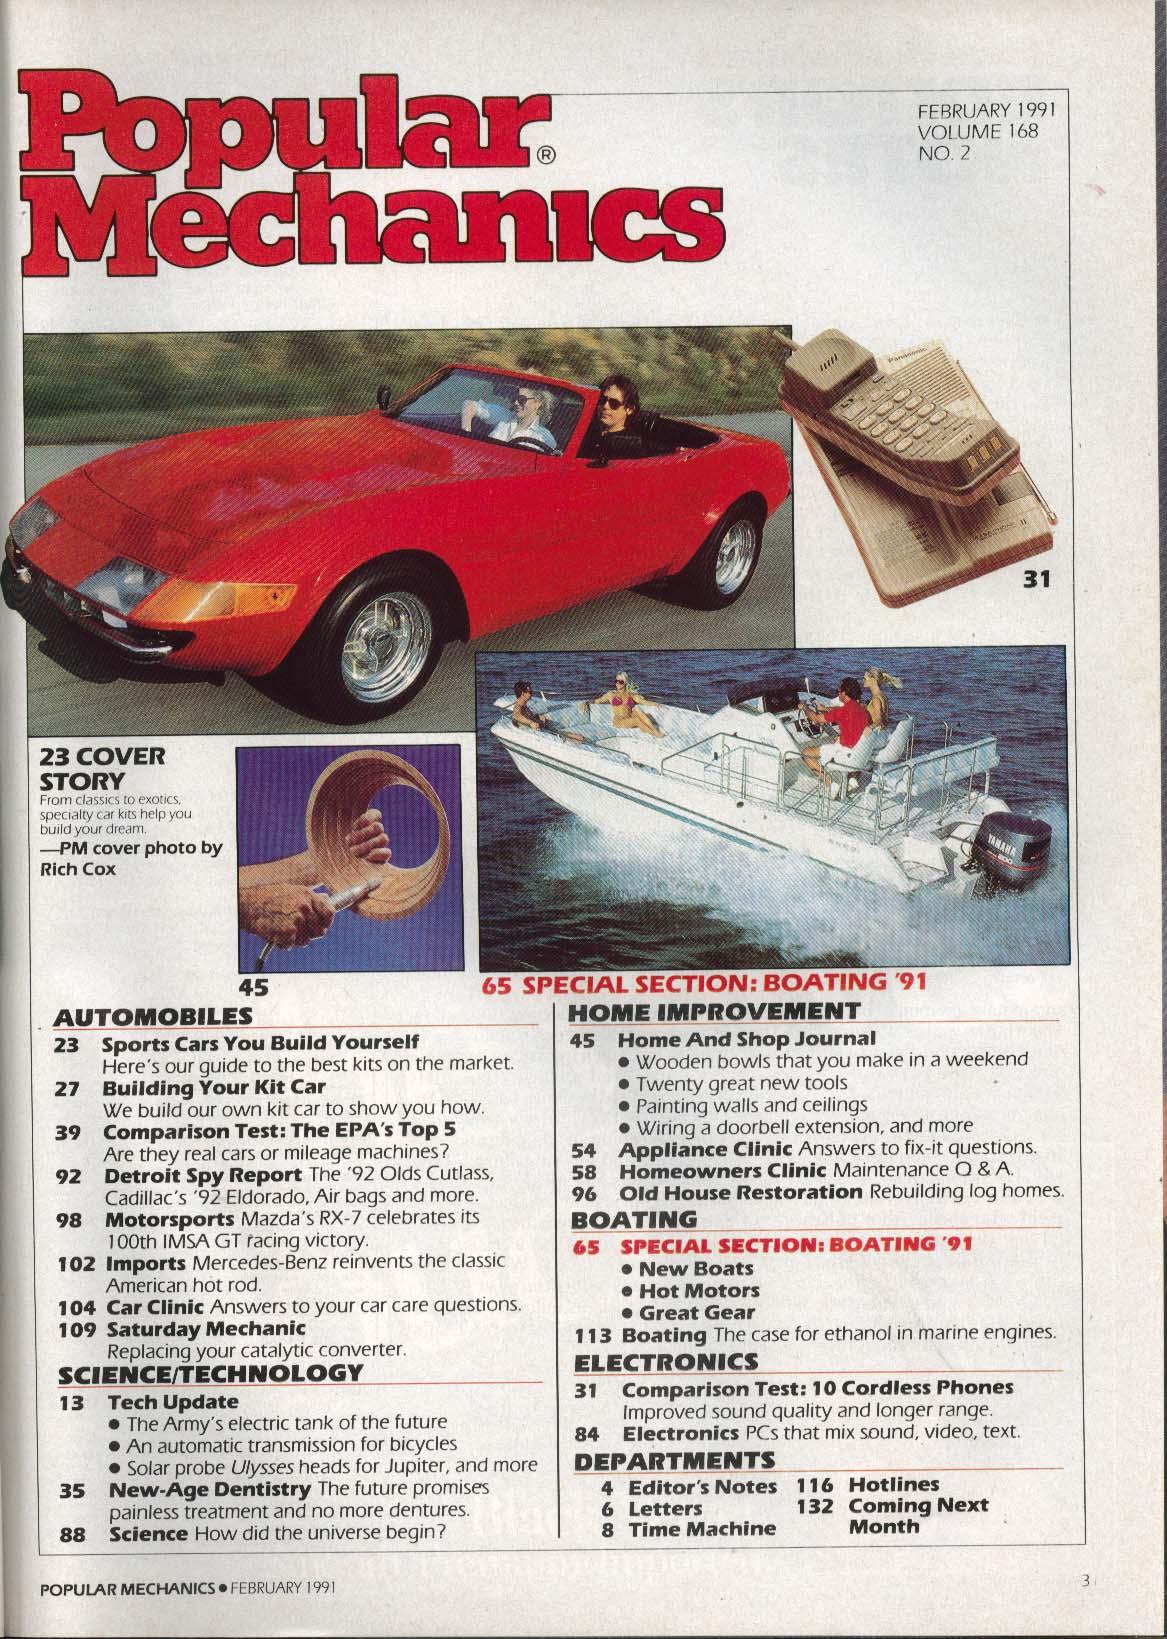 Image for POPULAR MECHANICS Olds Cutlass Cadillac Eldorado air bags Mercedes-Benz + 2 1991